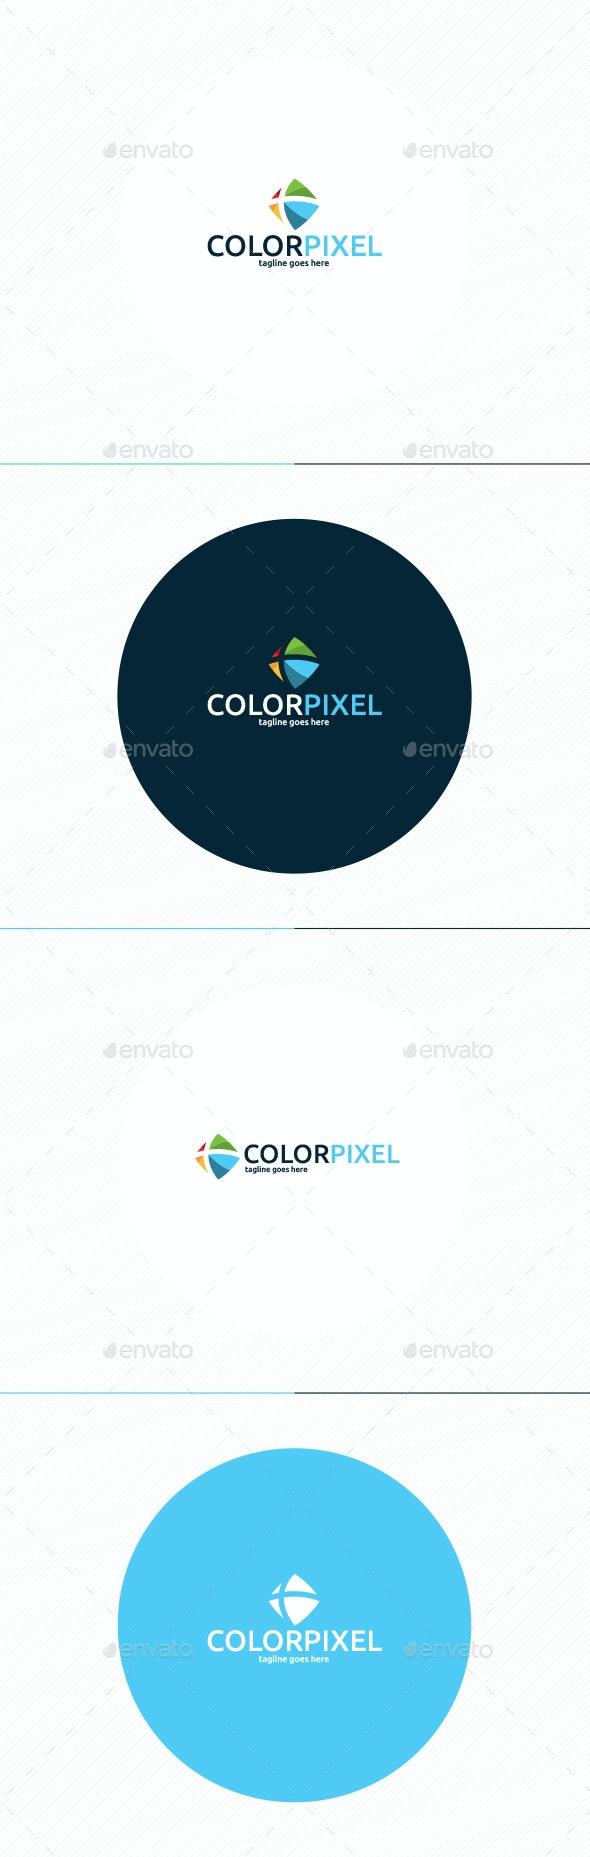 Color Pixel Logo - Vector Abstract